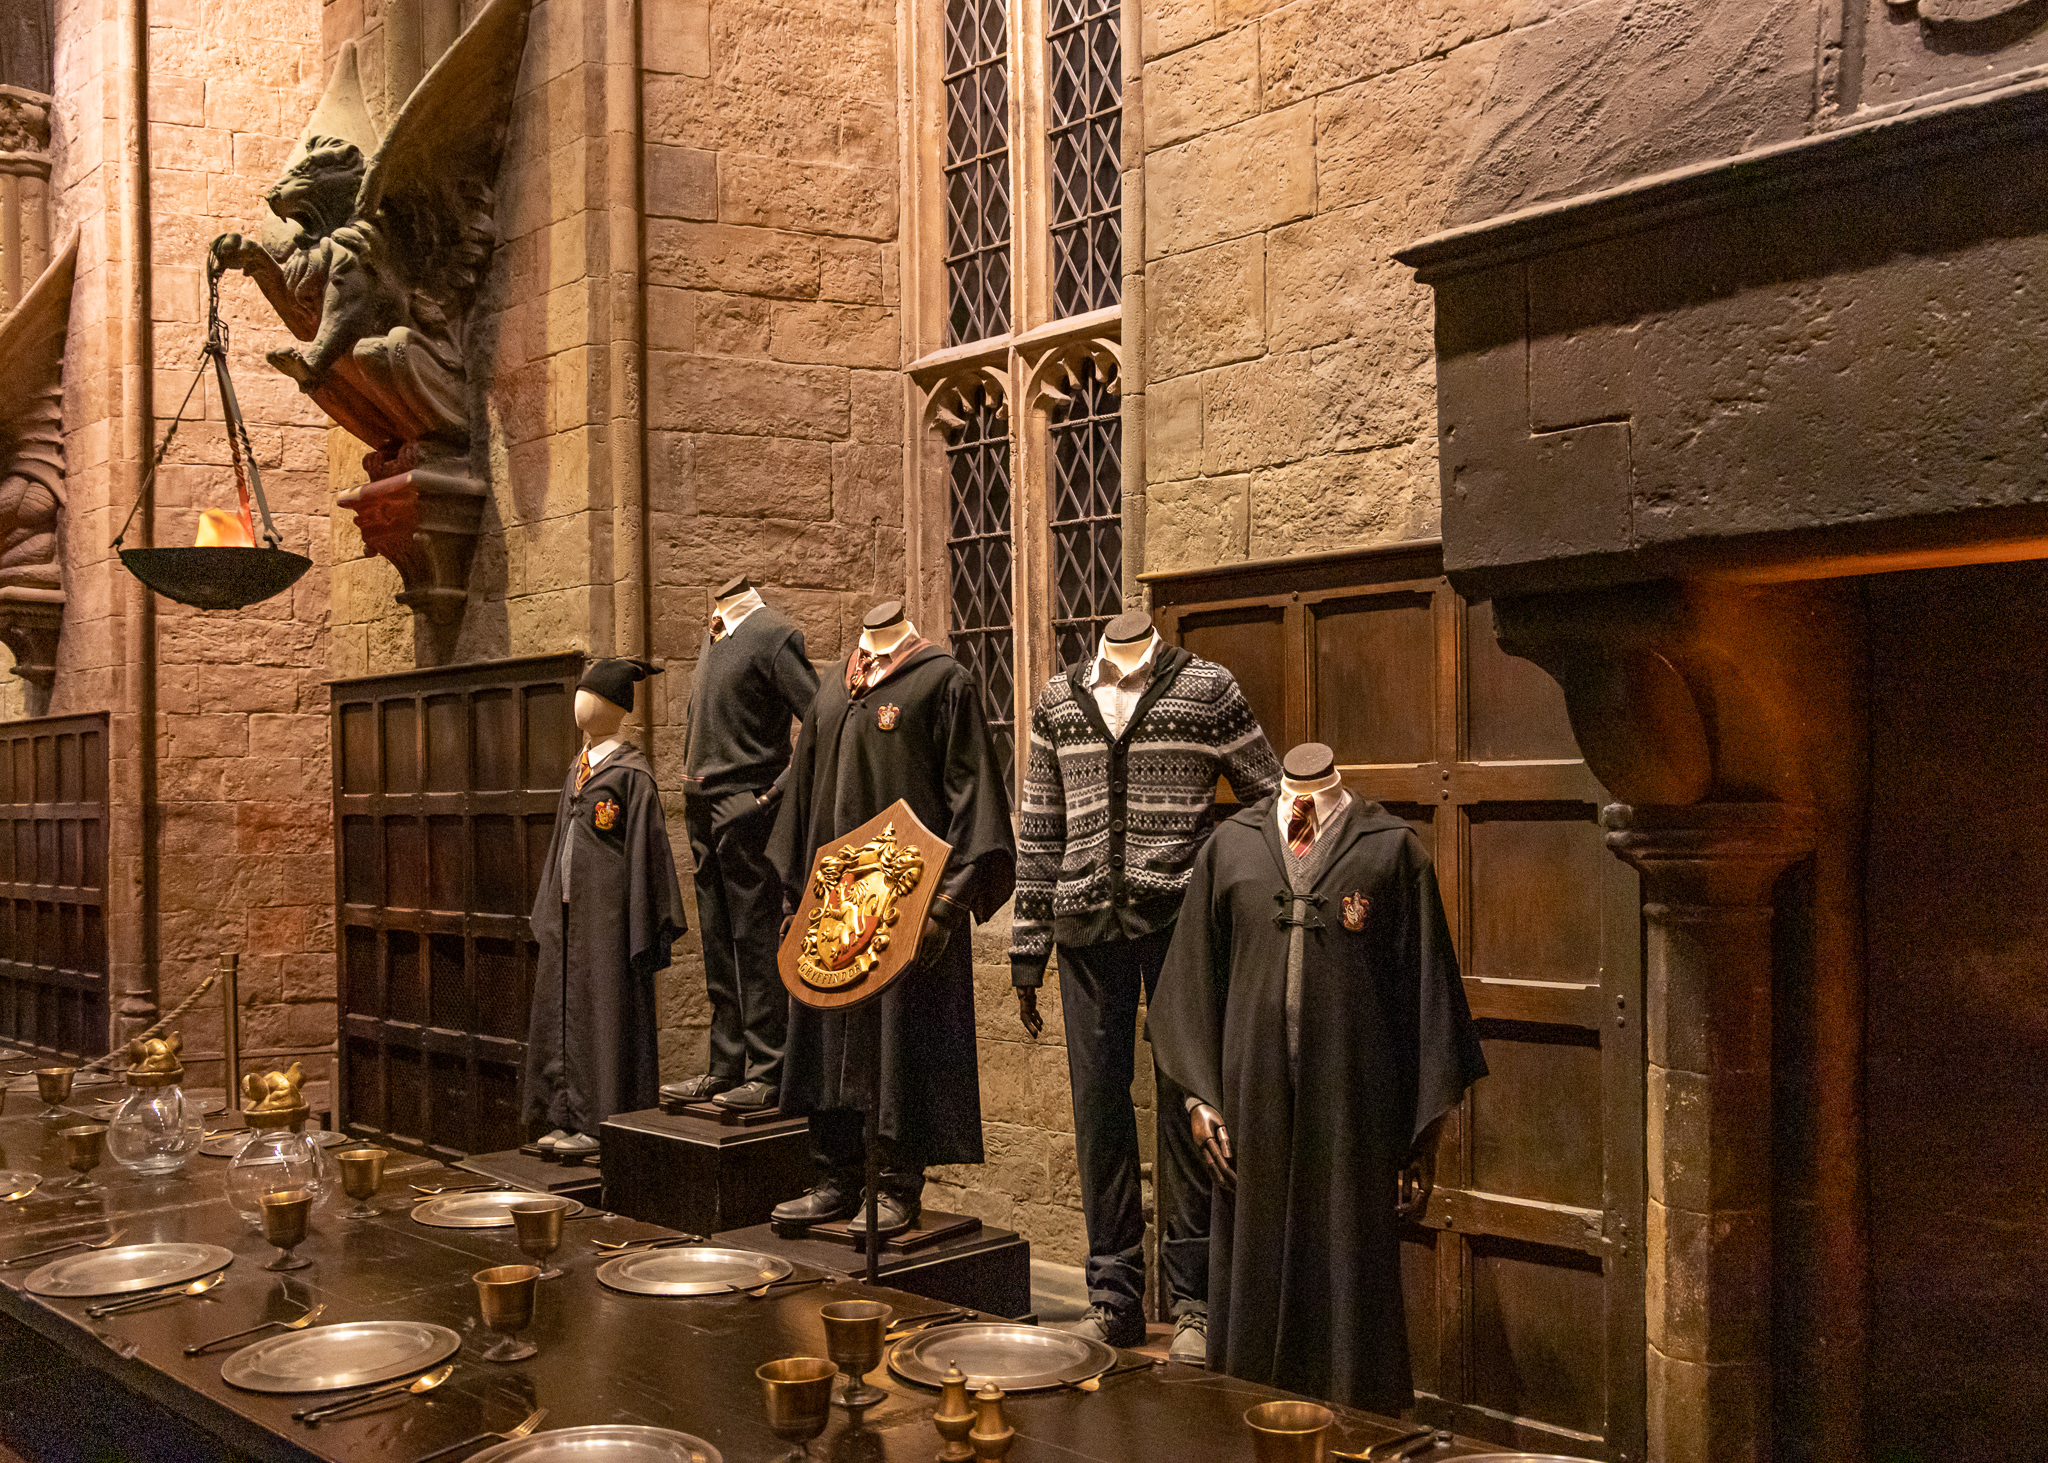 Hogwarts, of course